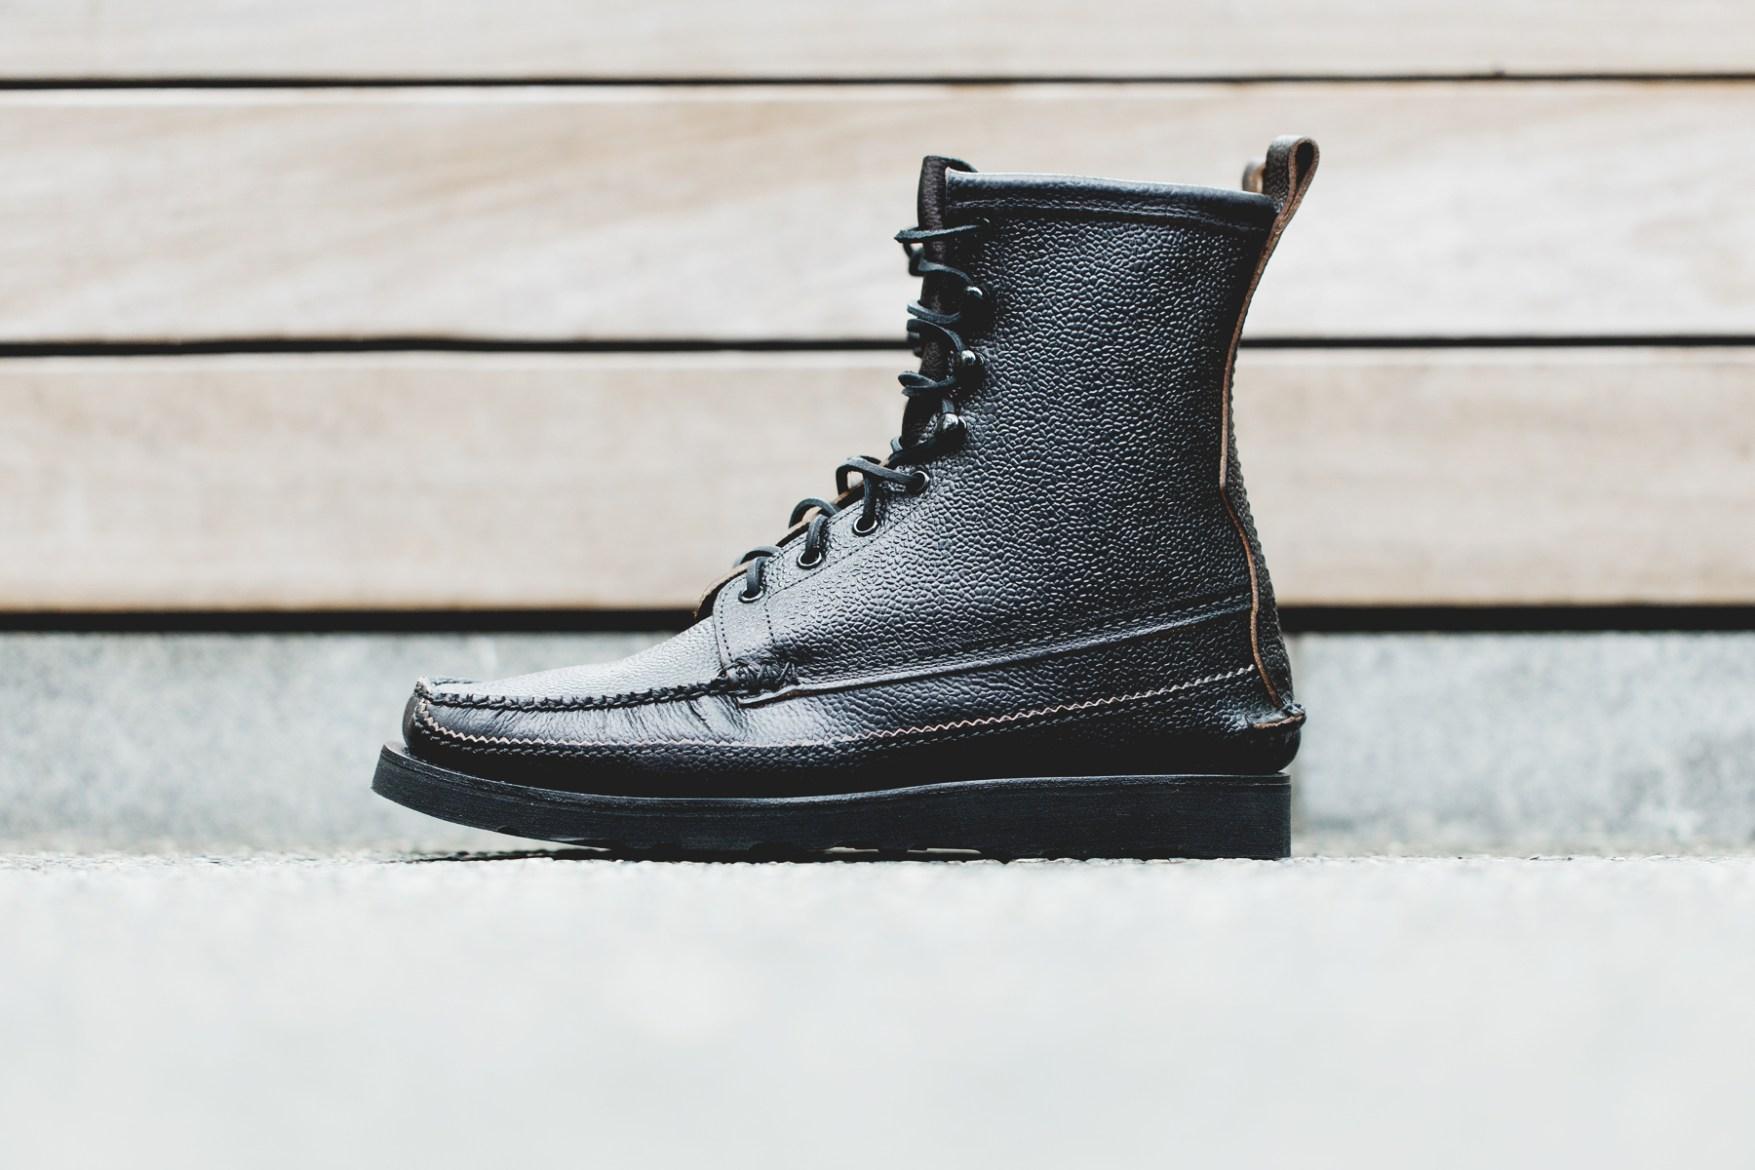 Yuketen 2014 Fall/Winter Maine Guide Boots | HYPEBEAST